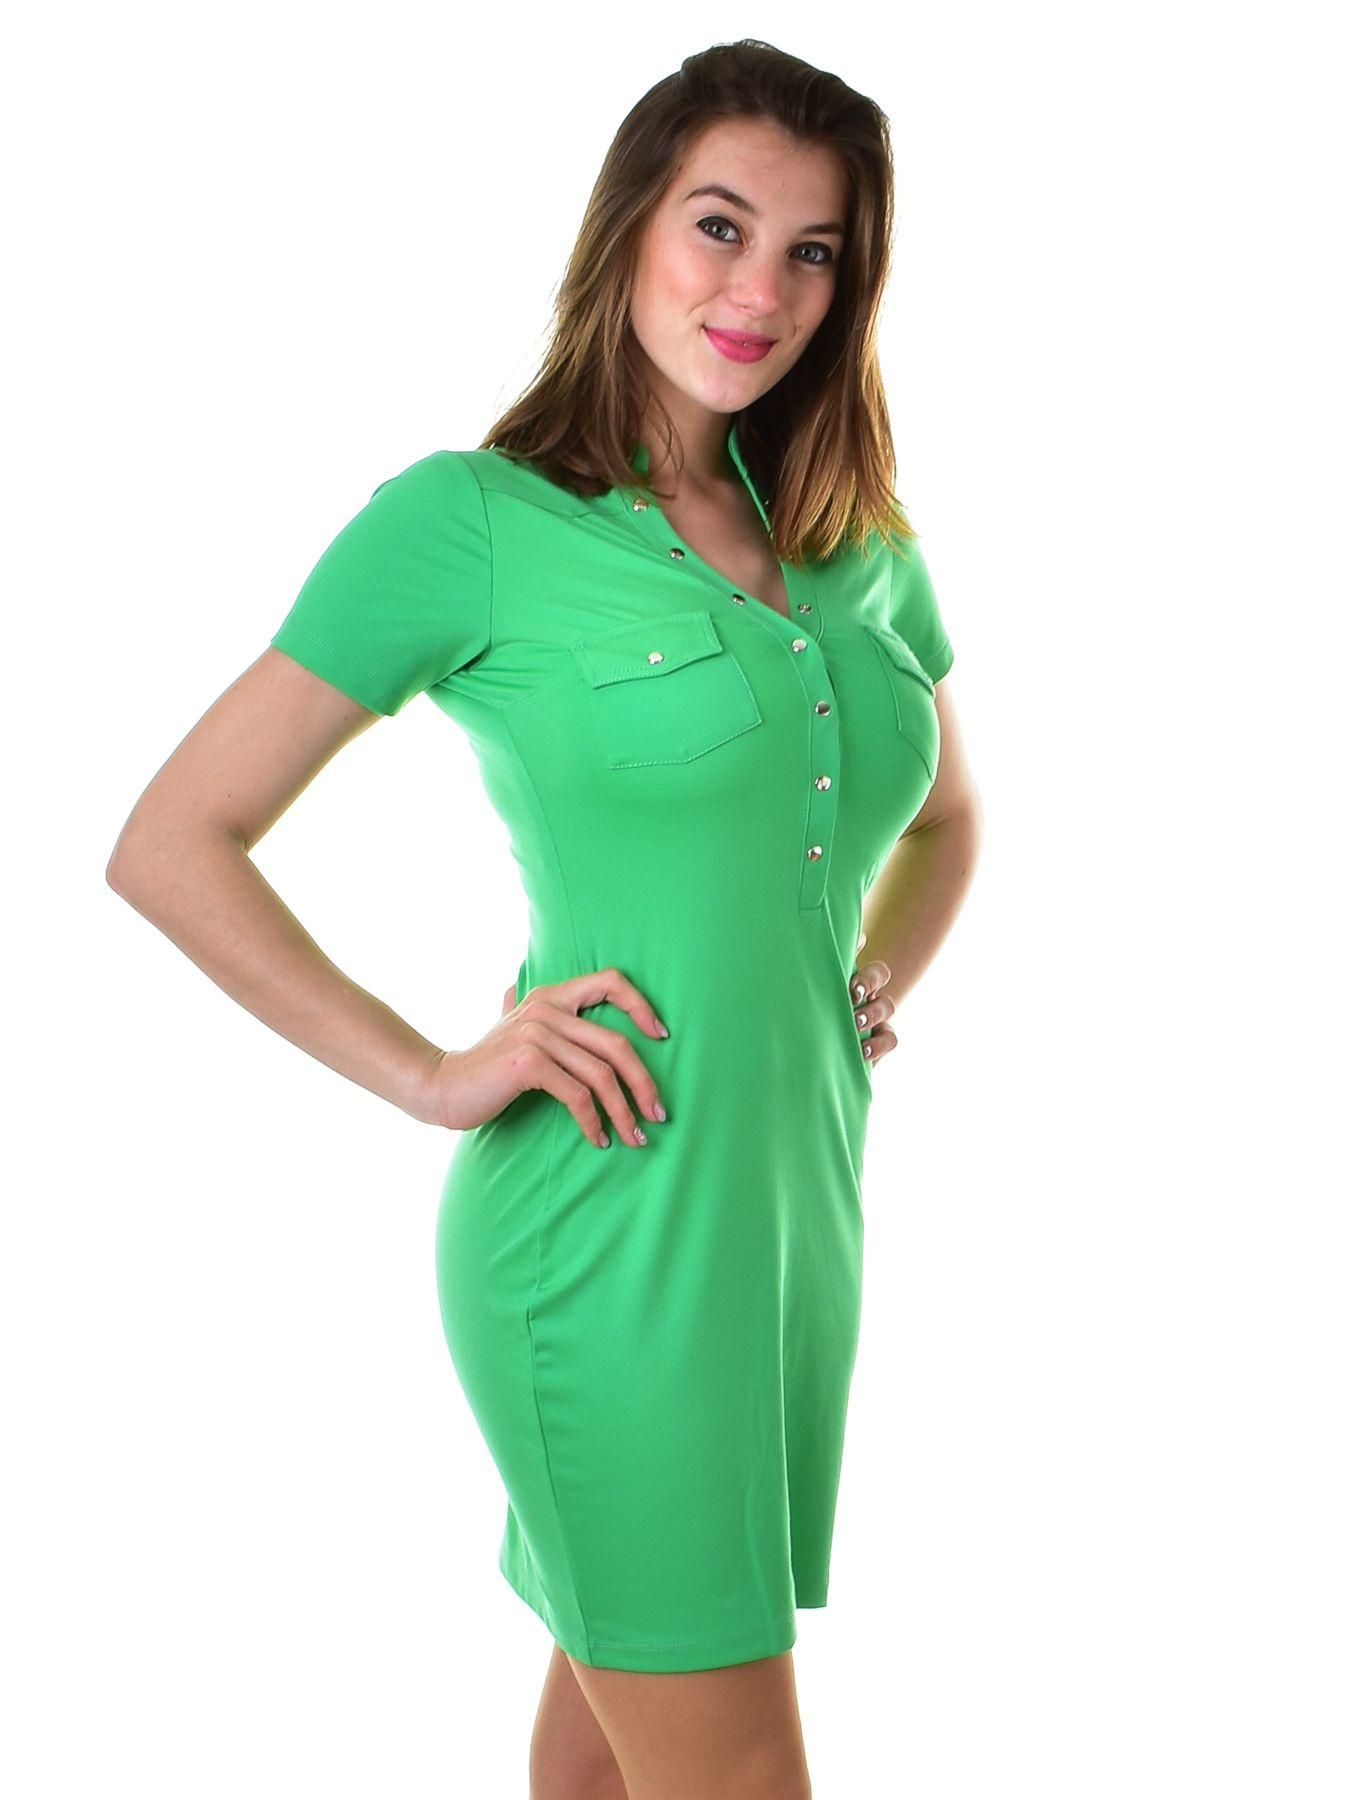 342d062637 Mayo Chix női ruha STYLE | Markasbolt.hu Hivatalos Mayo Chix forgalmazó